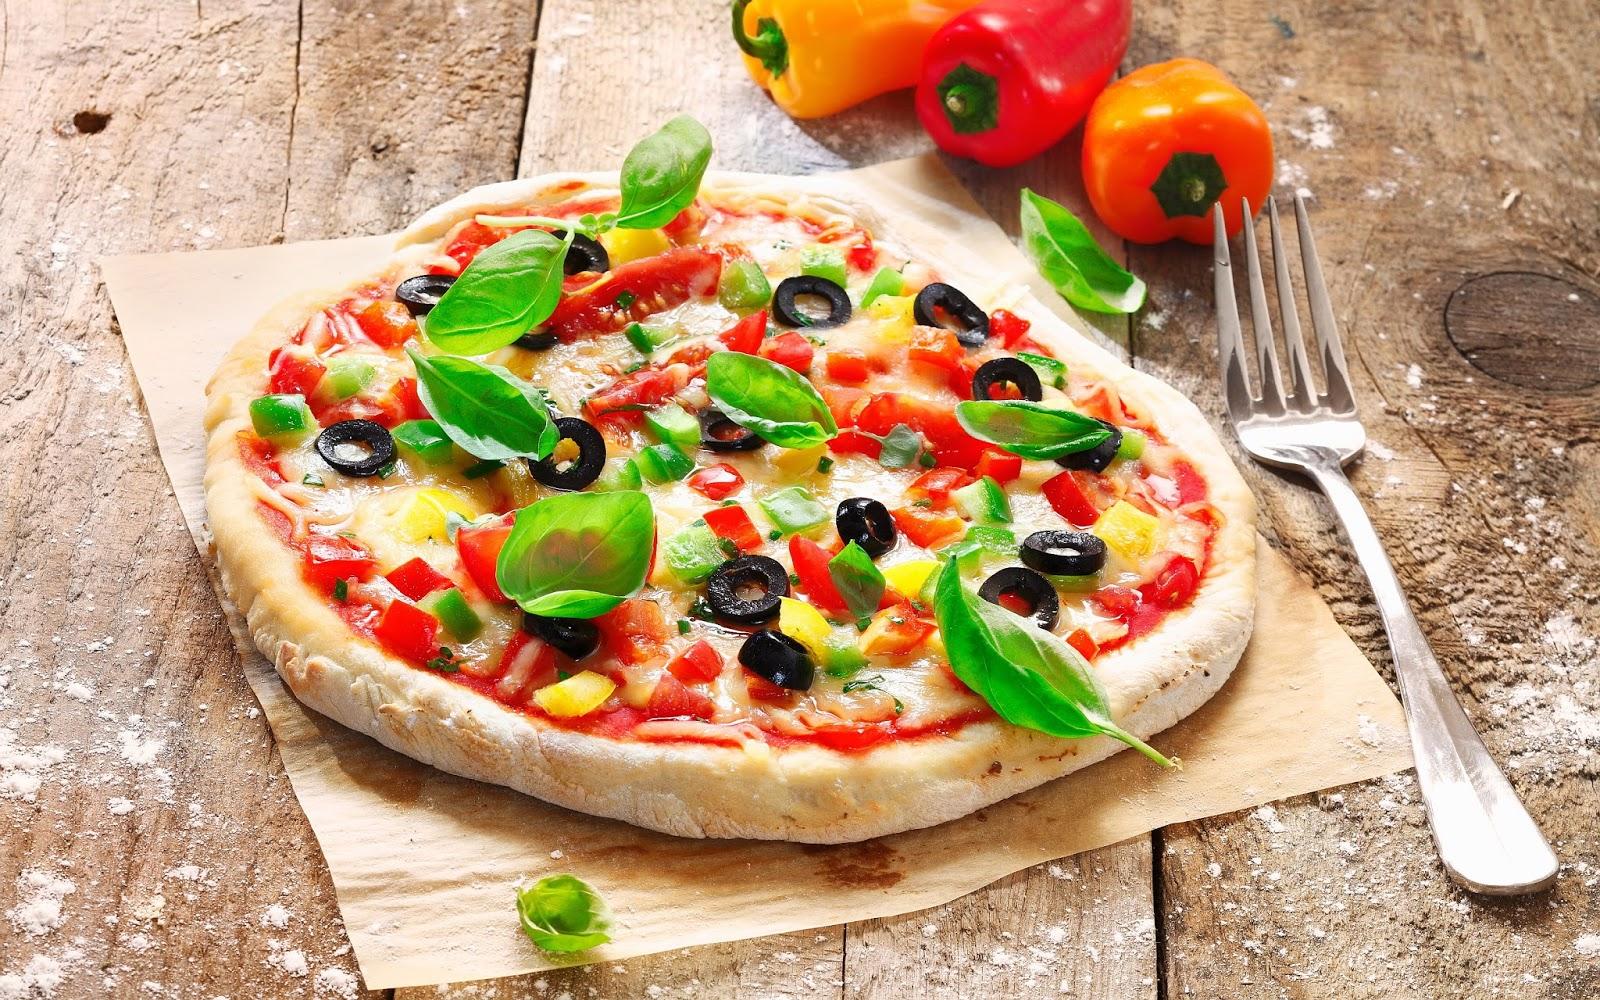 Italian cuisine and pizza